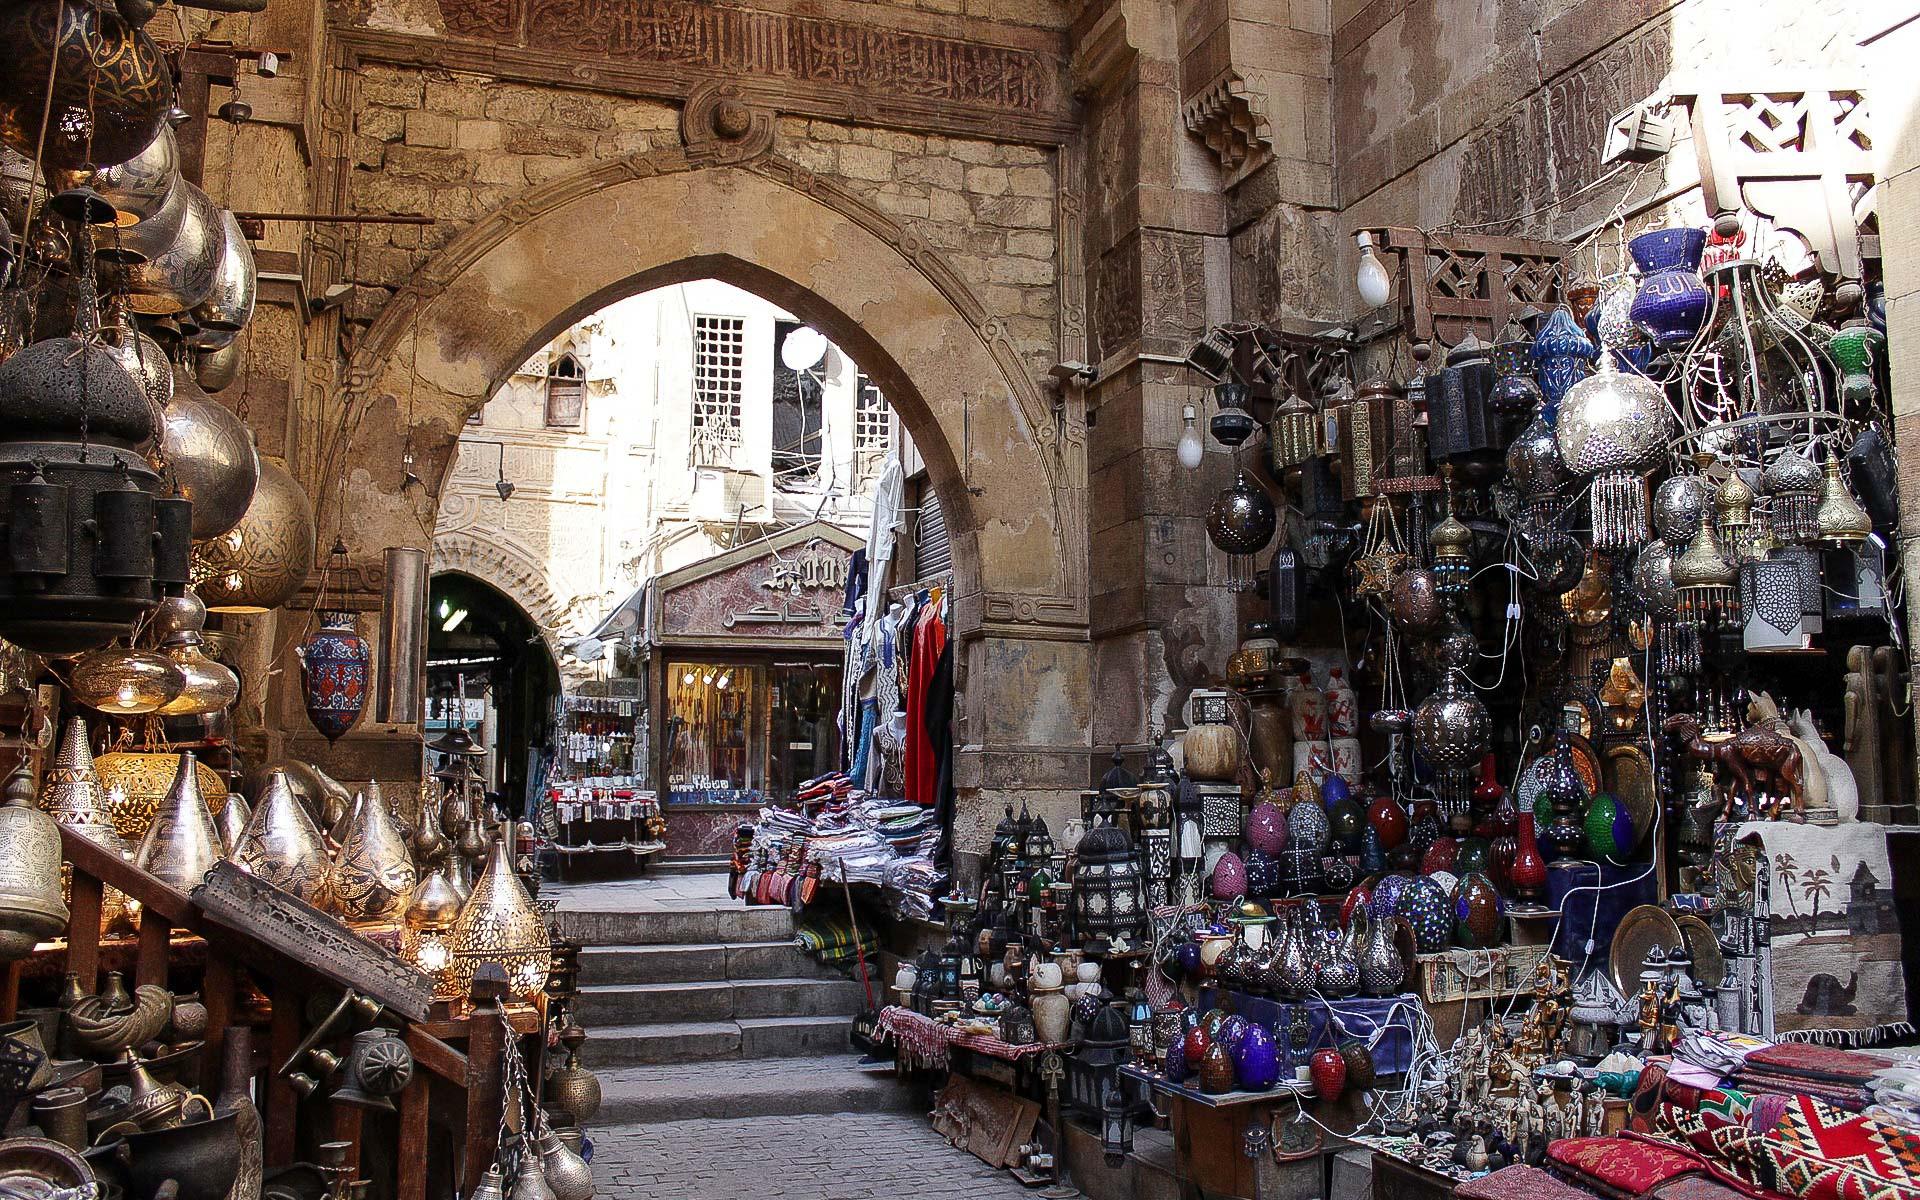 LesVoyageuses-organiser-voyage-egypte-conseils-3